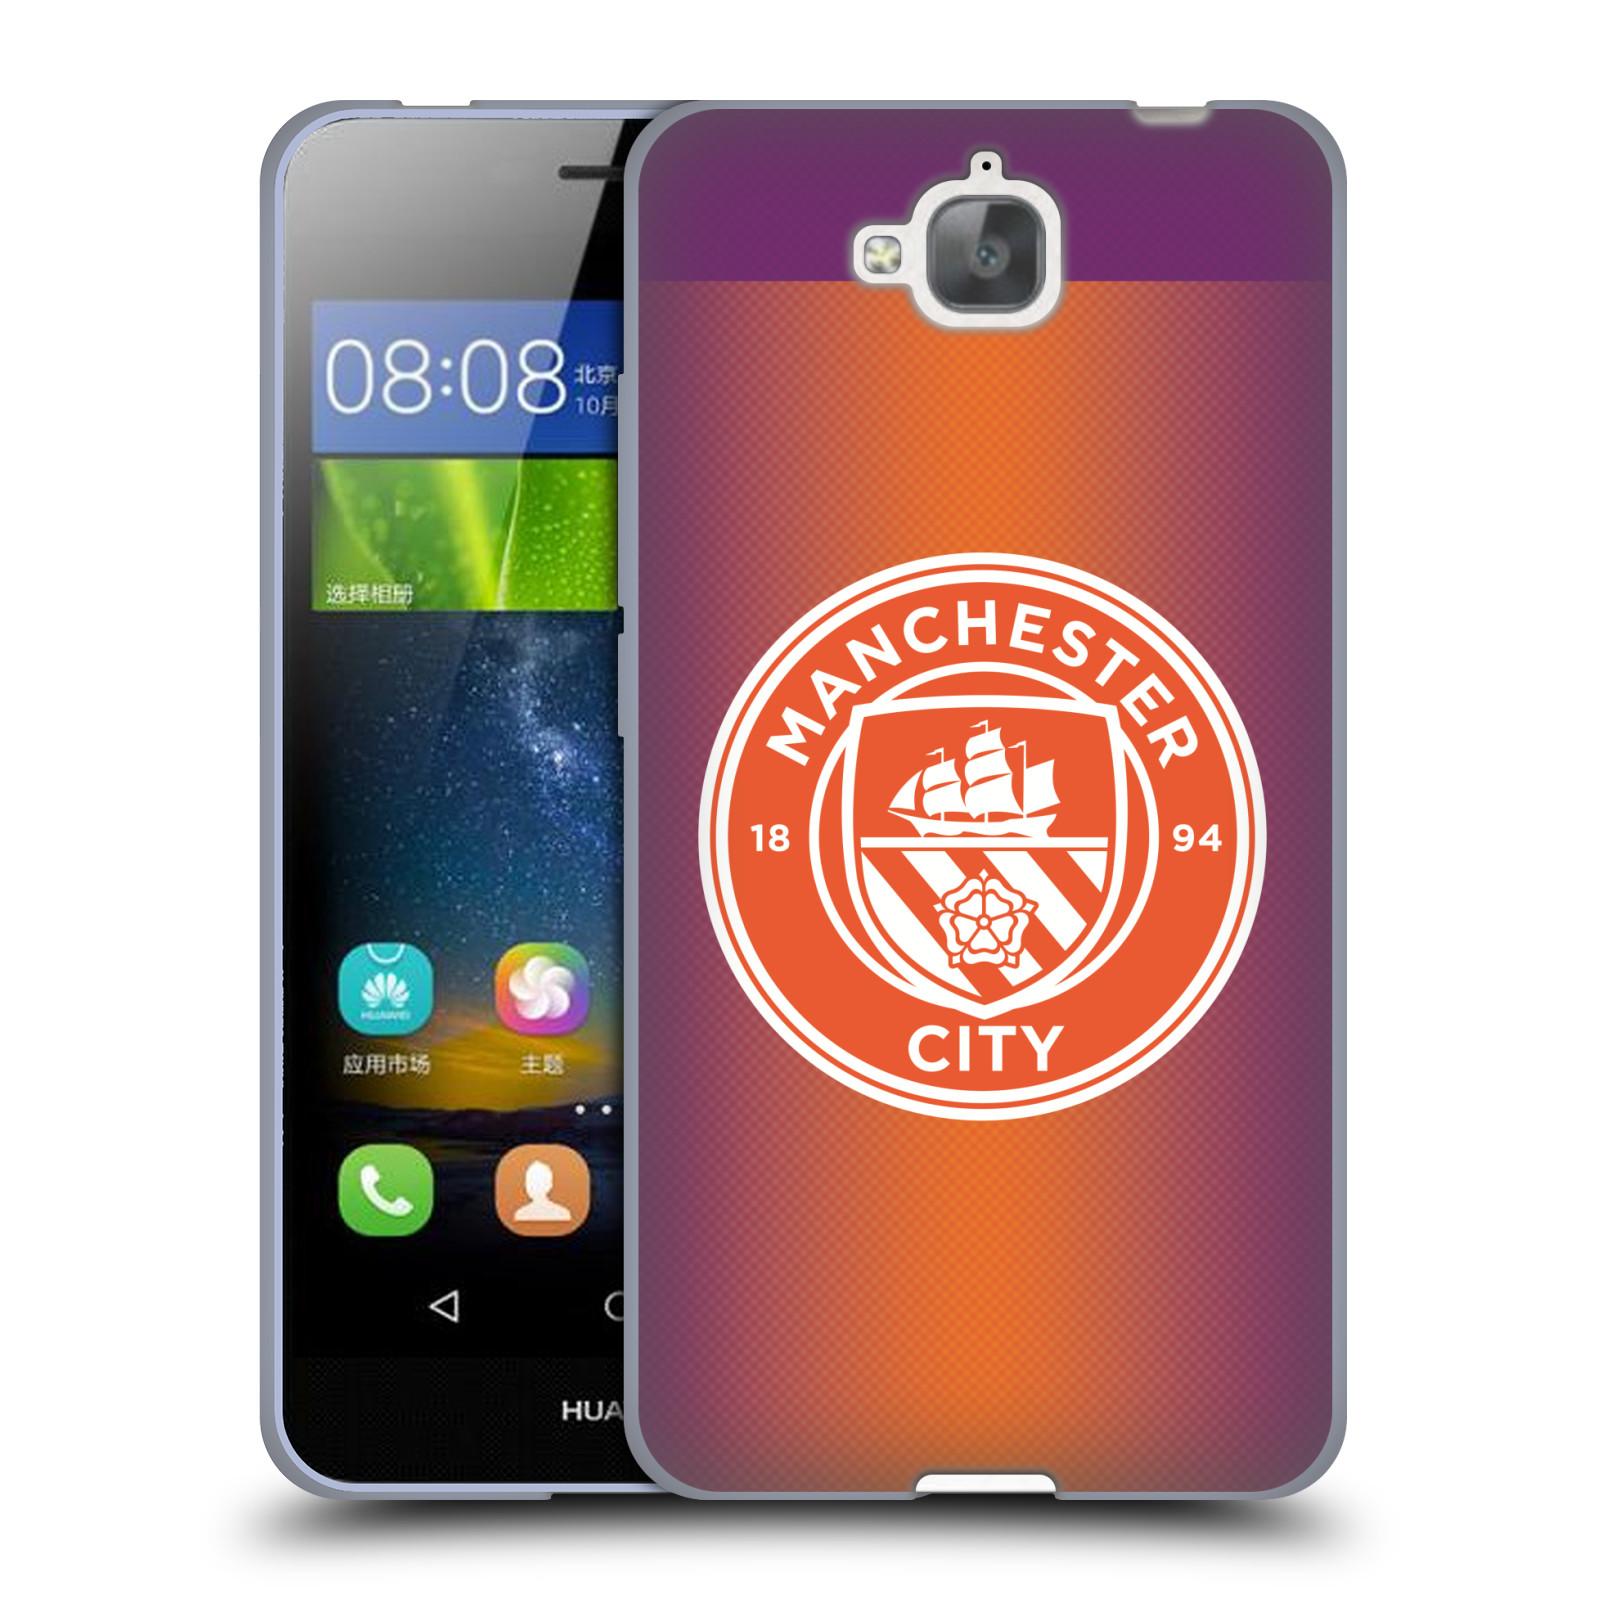 Silikonové pouzdro na mobil Huawei Y6 Pro Dual Sim HEAD CASE Manchester City FC - Oranžové nové logo